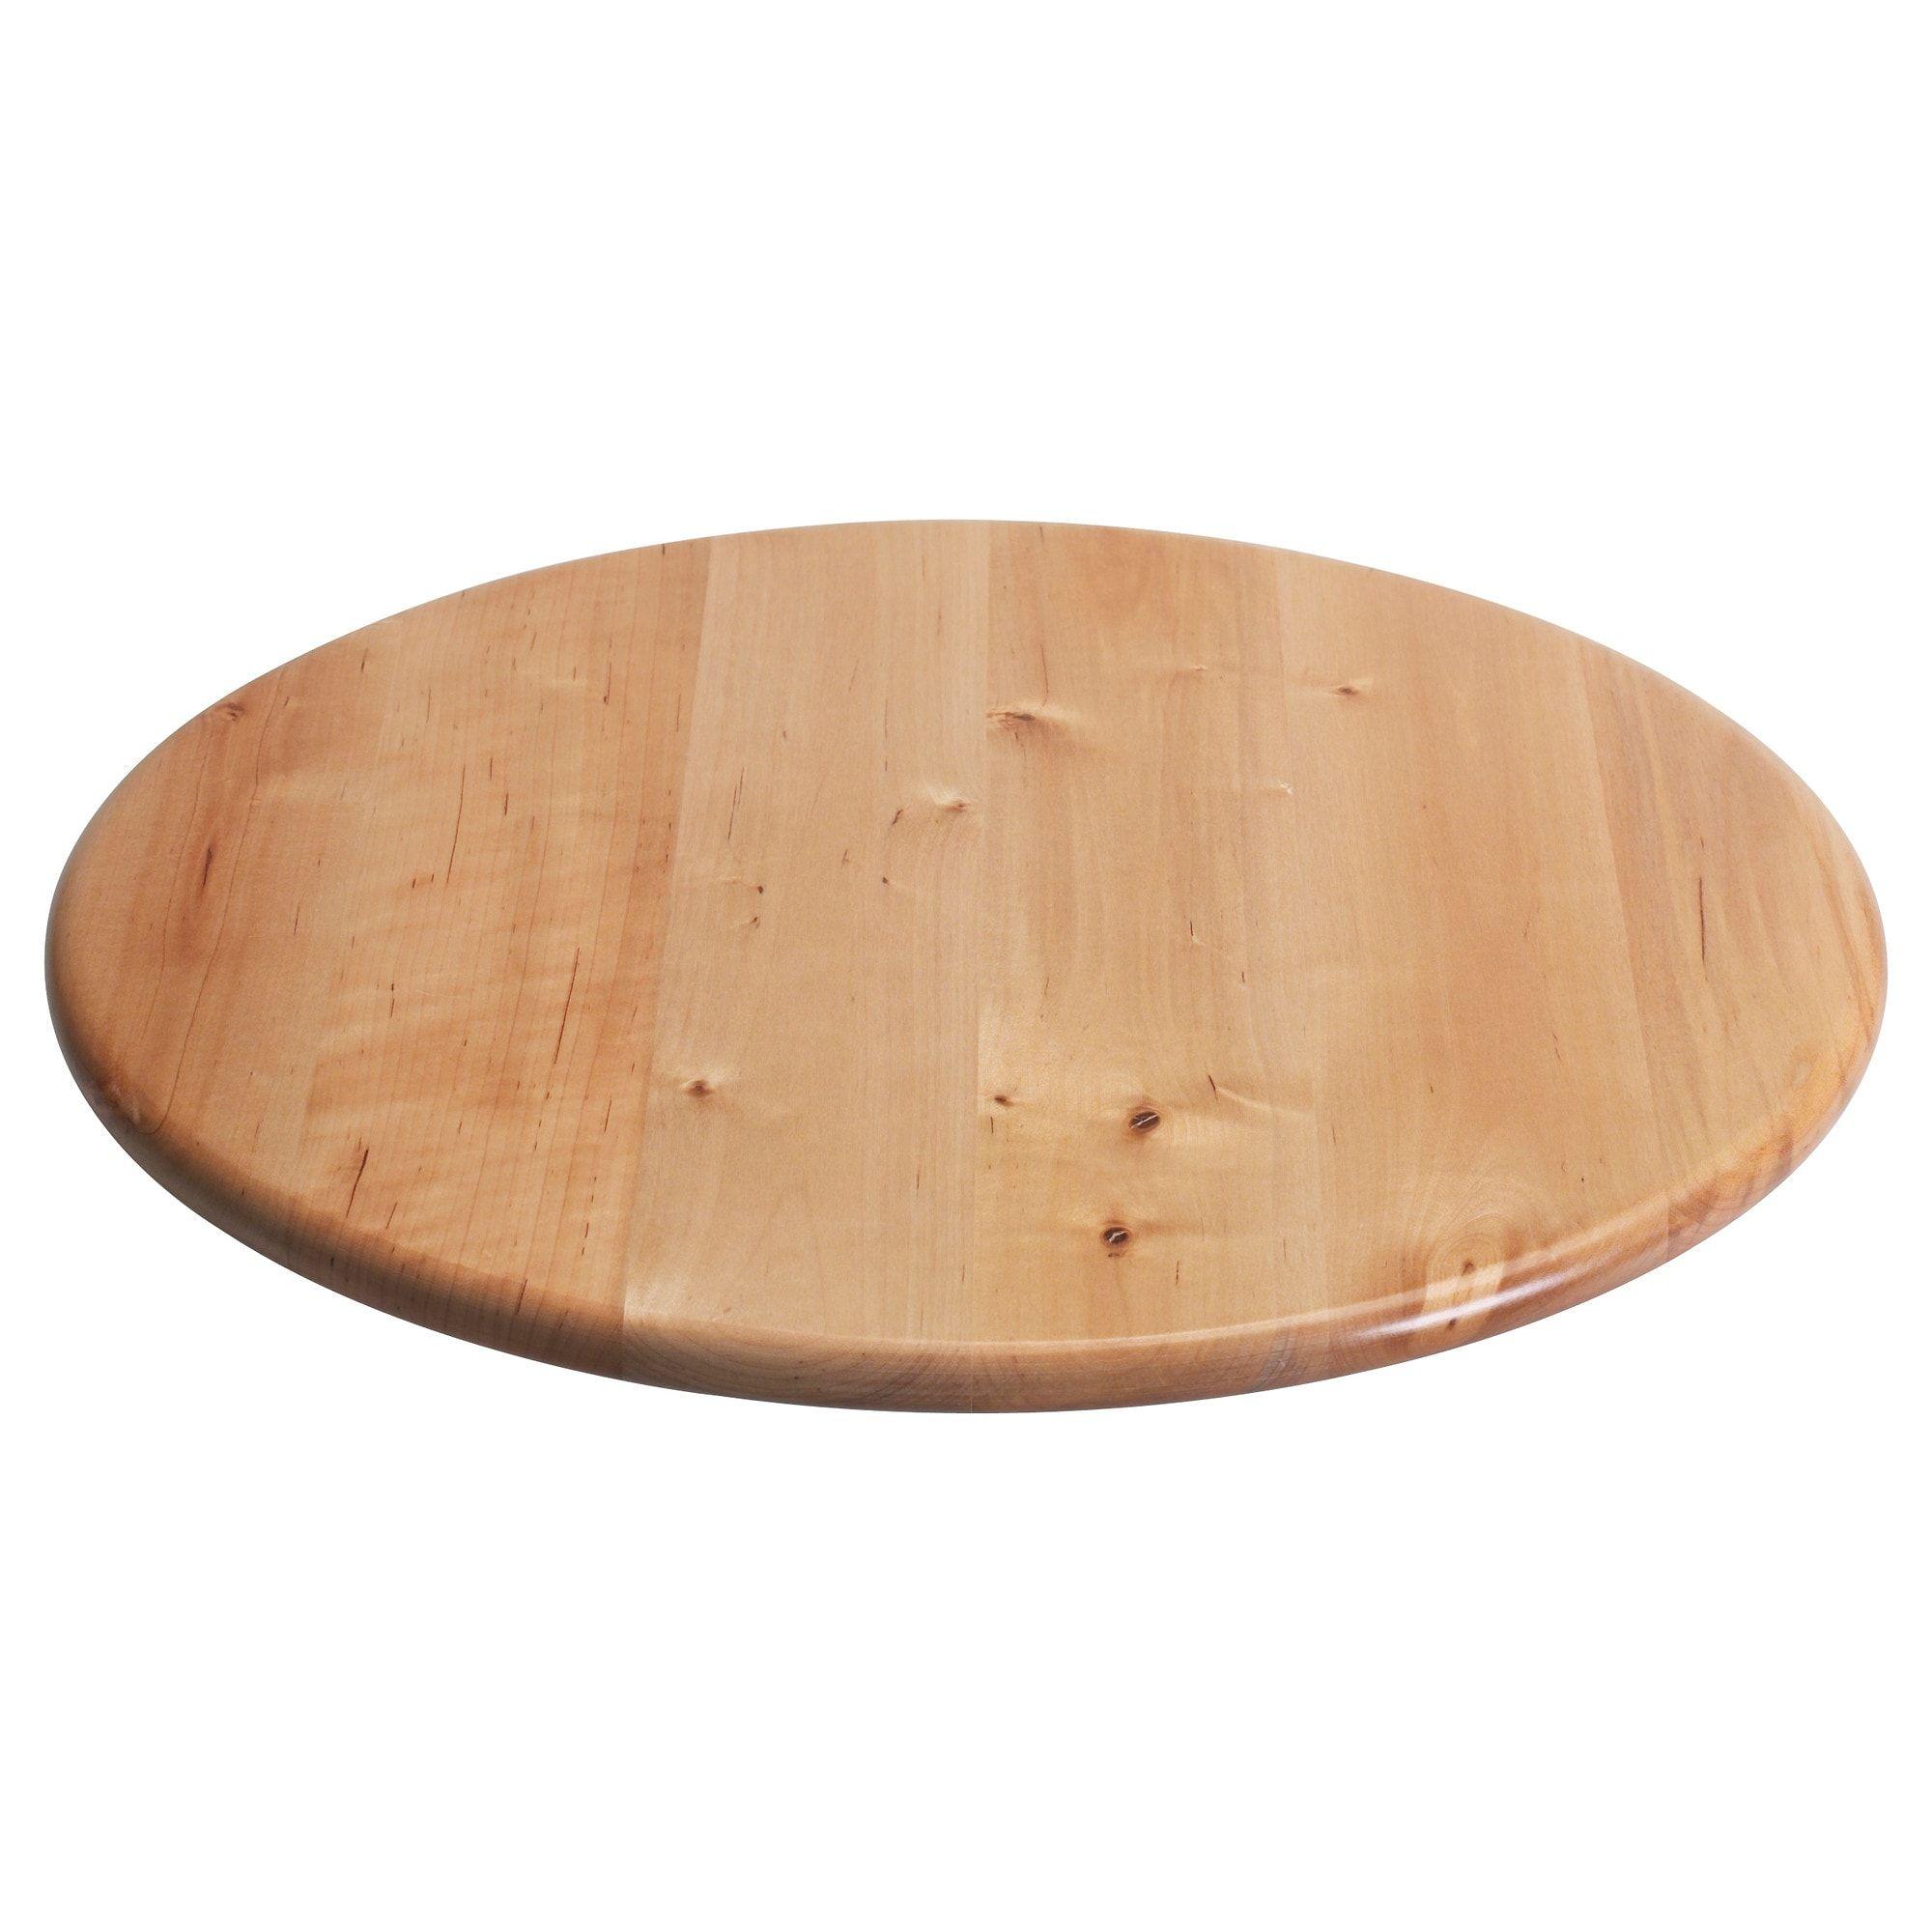 Snudda Lazy Susan Solid Wood Birch Ikea Madera Maciza Losas Macizas Madera